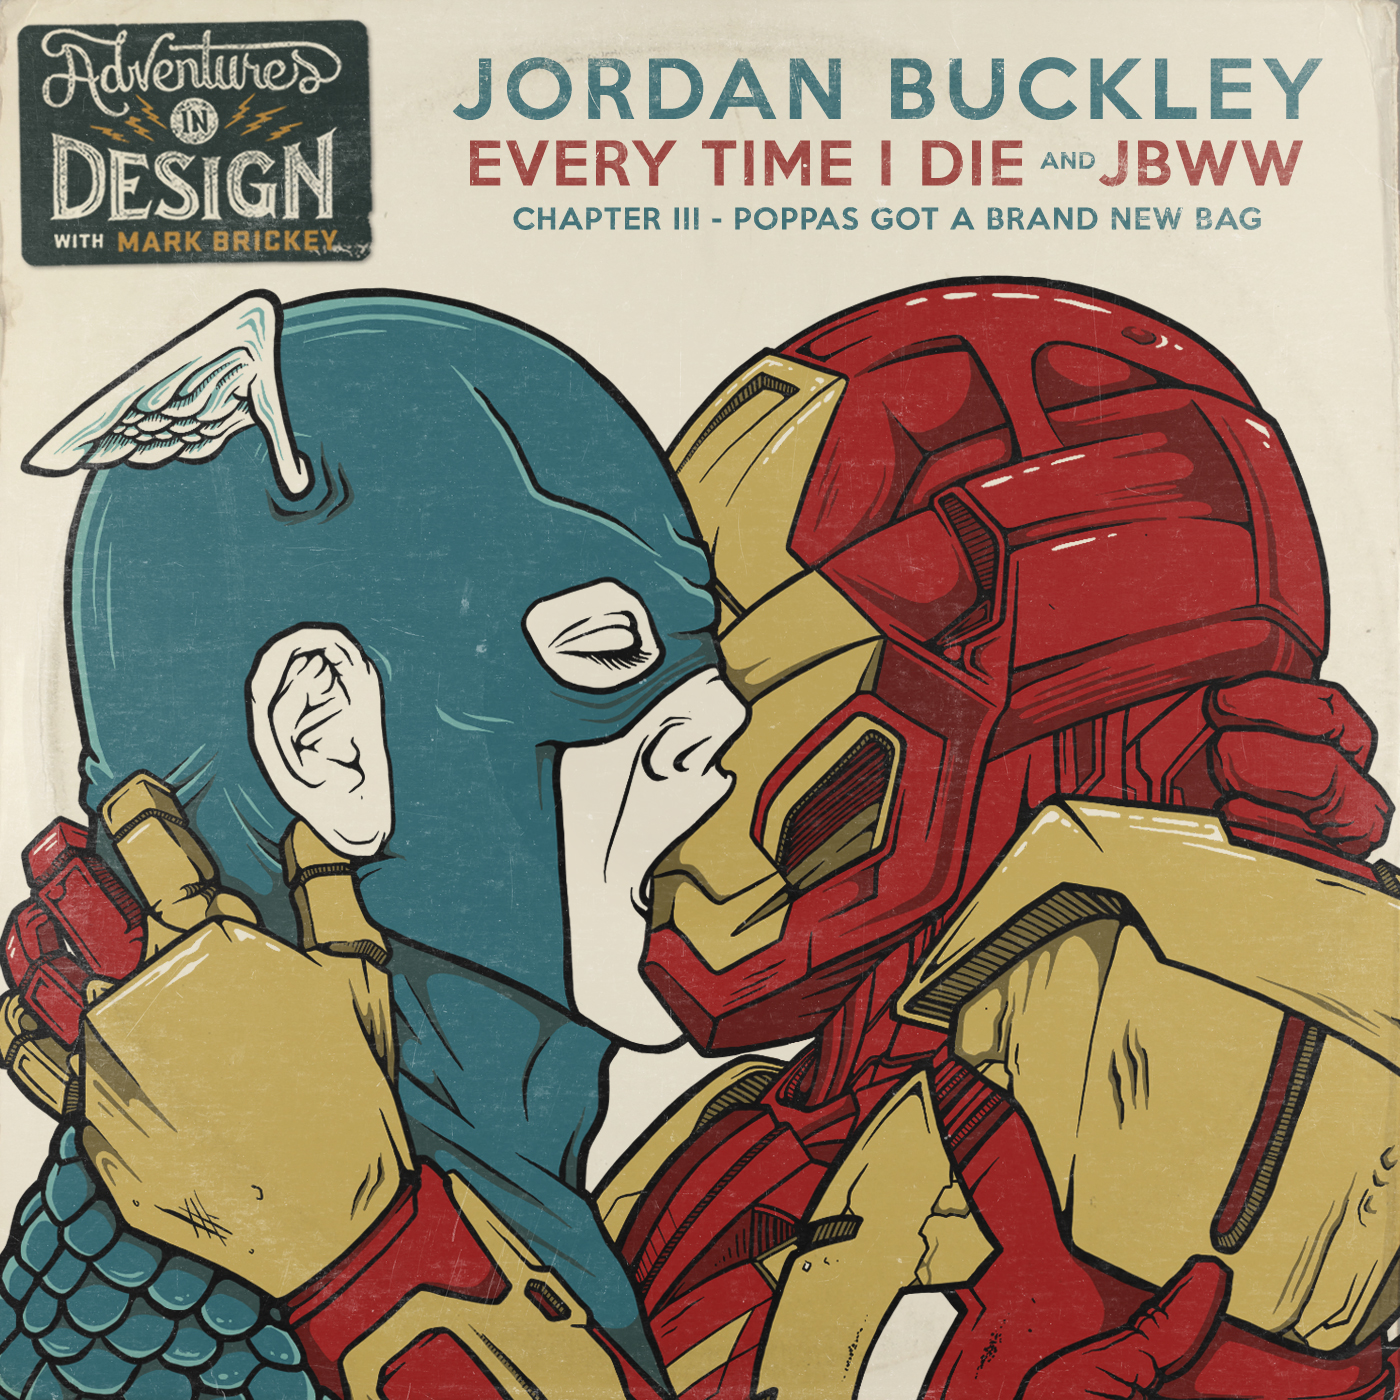 405 - Jordan Buckley of Every Time I Die and JBWW.com